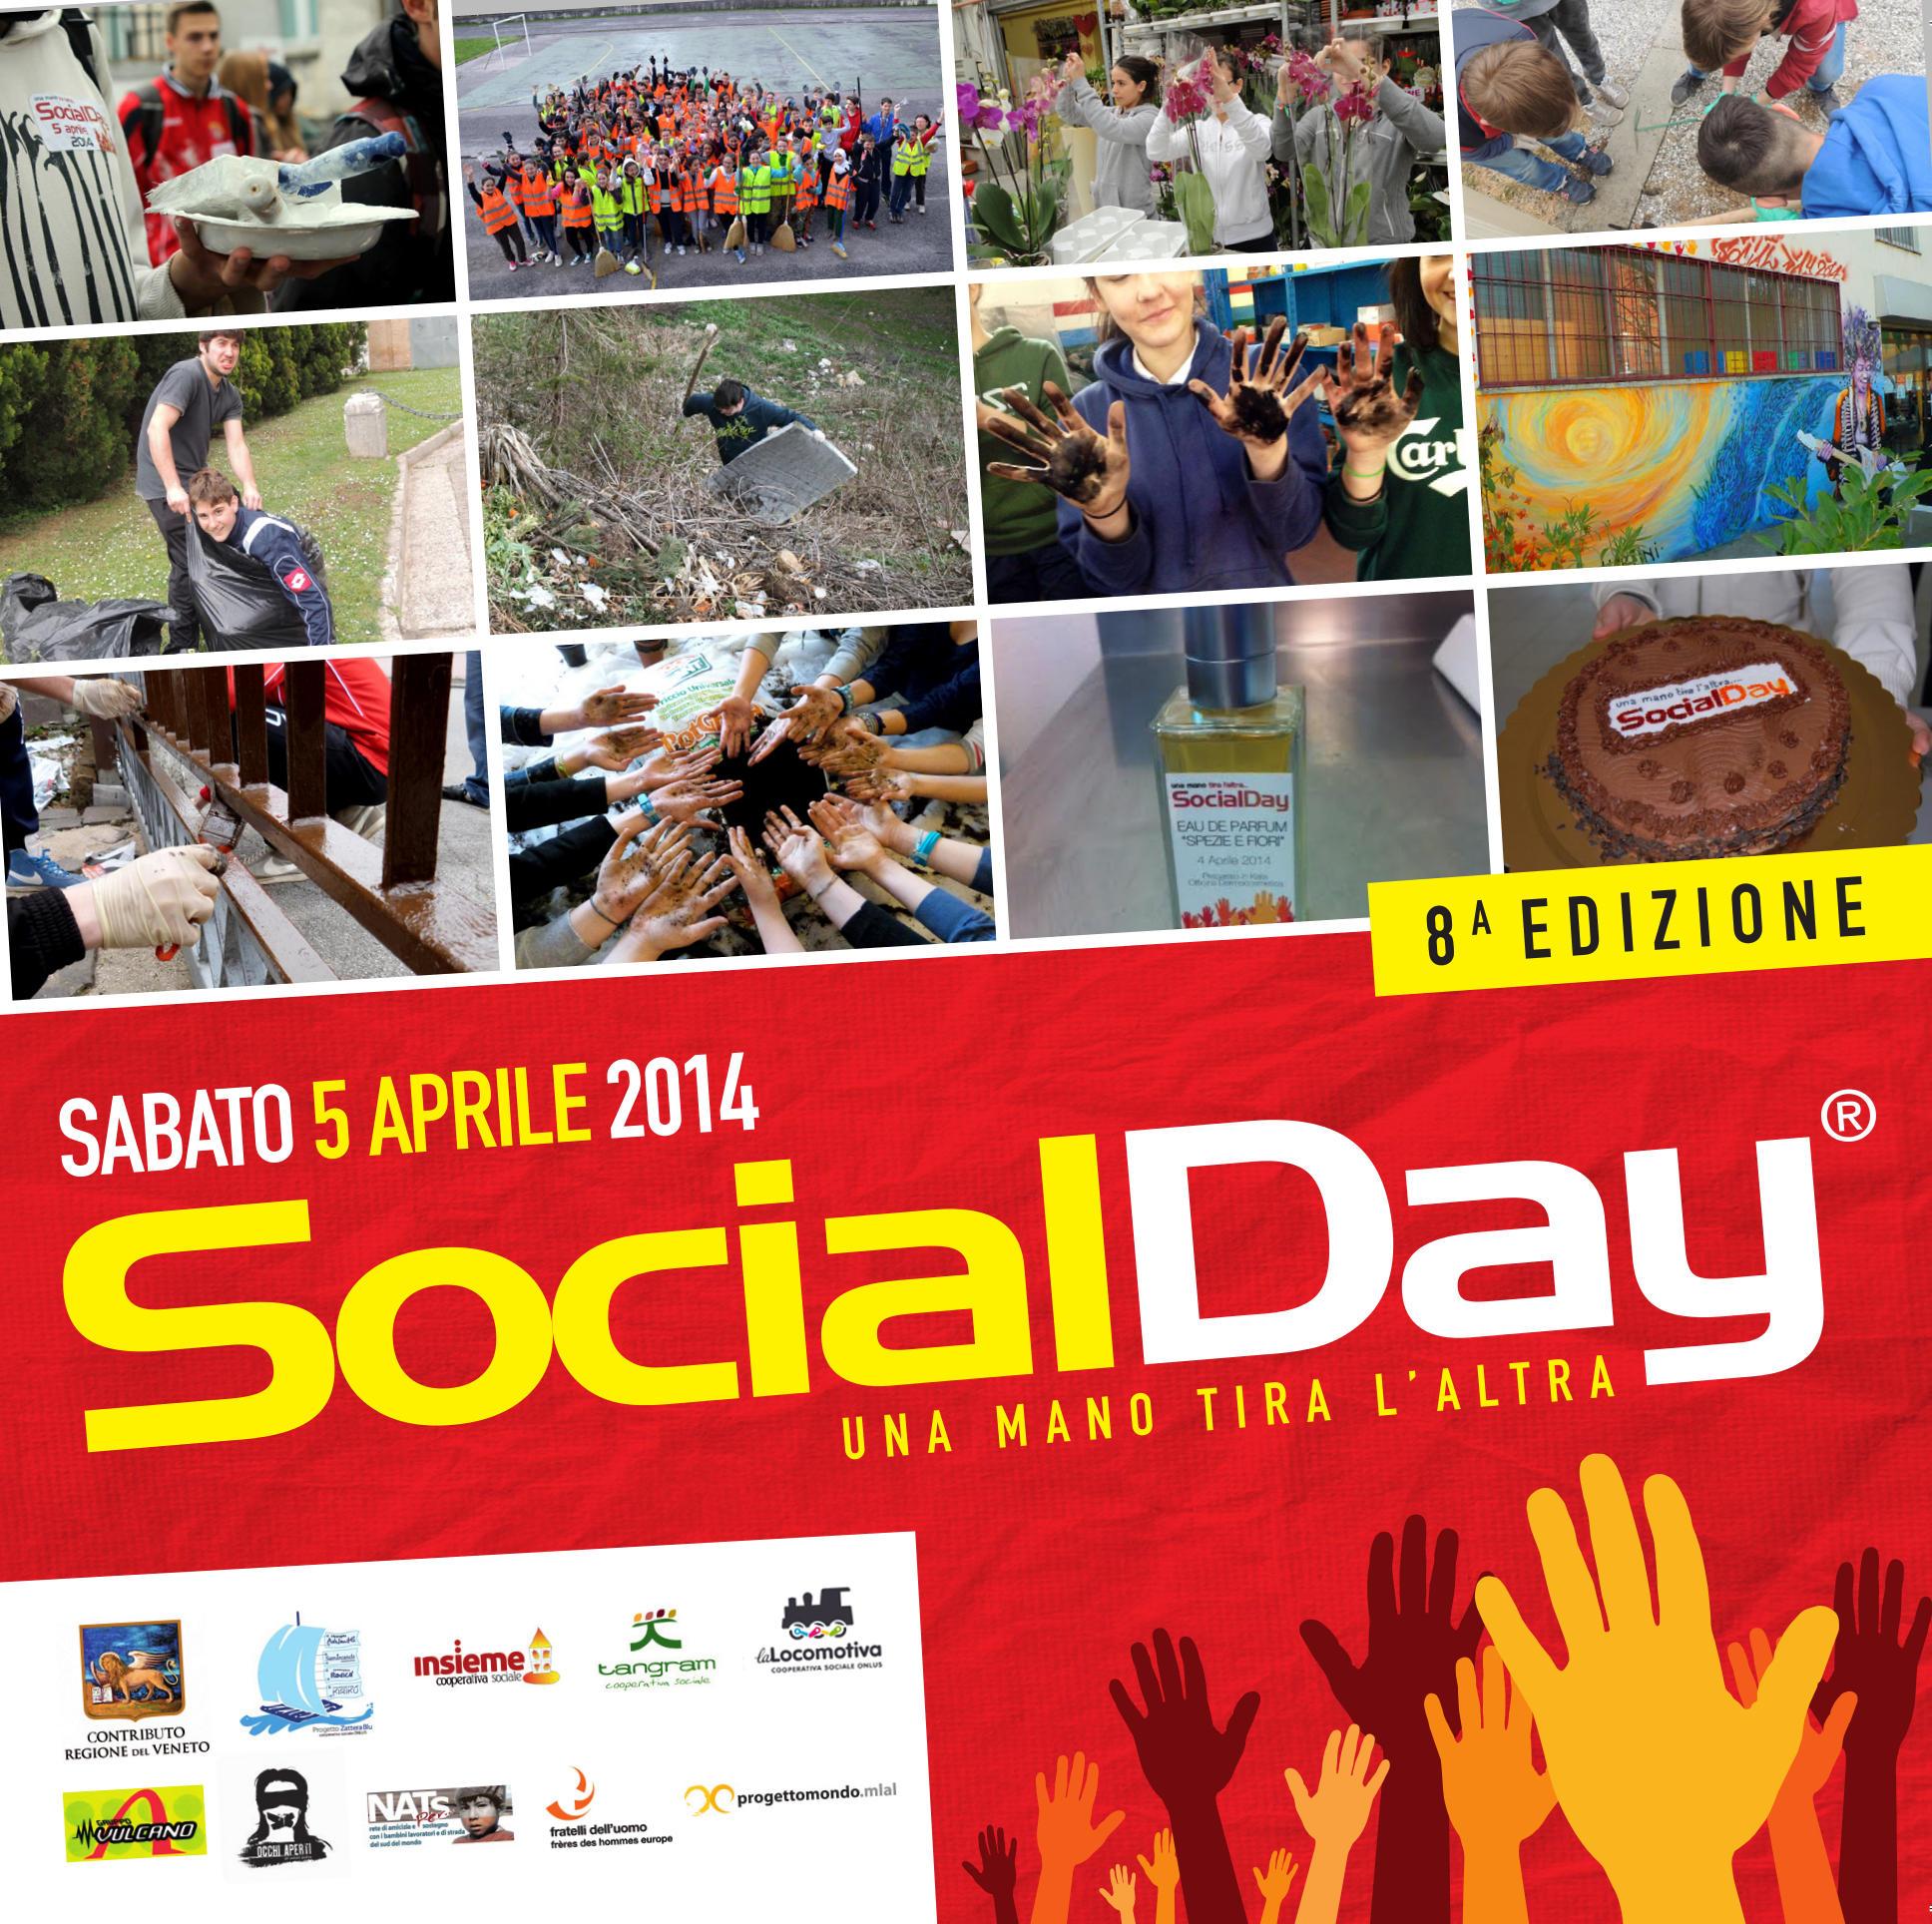 social day 2014 risultati